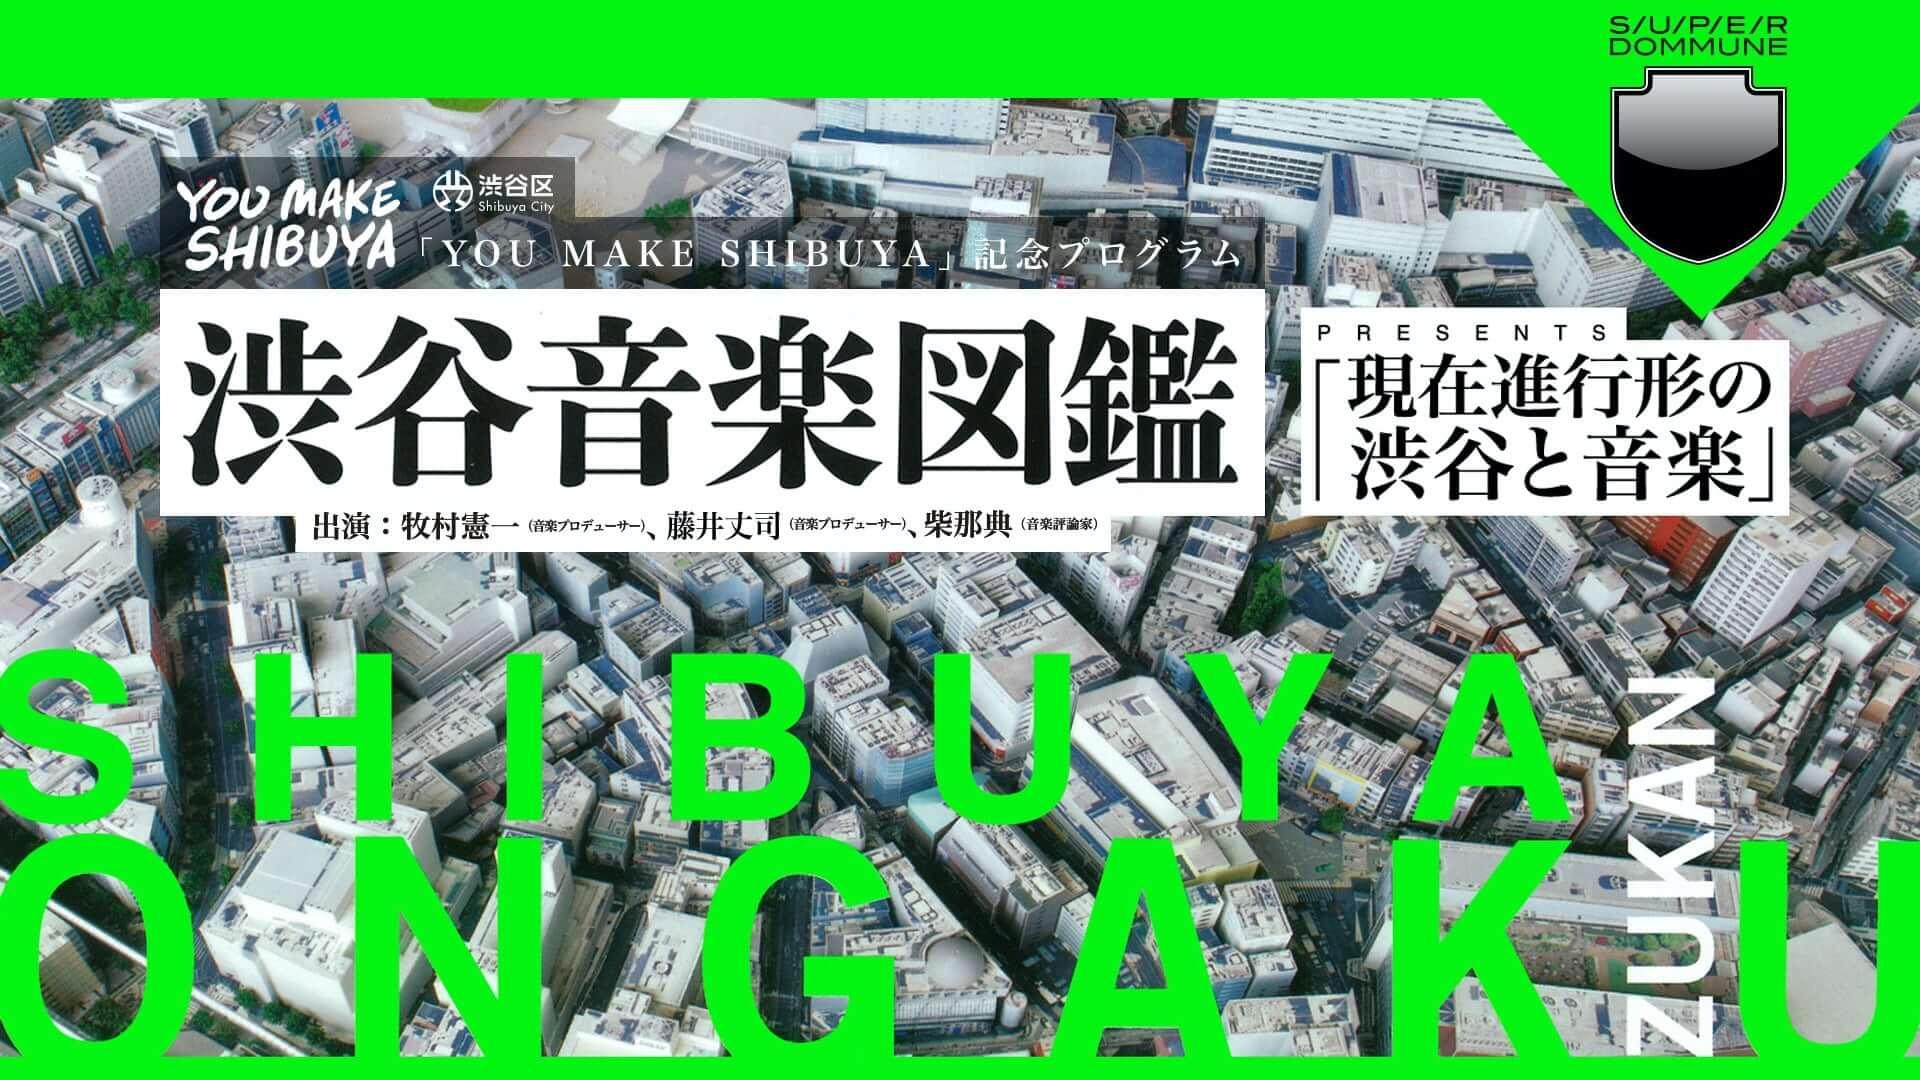 SUPER DOMMUNEにて配信される<SHIBUYA CULTURAL LIBRARY>の全ラインナップが発表!toe、yahyel、大門弥生も出演 music200827_youmakeshibuya-dommune_1-1920x1080